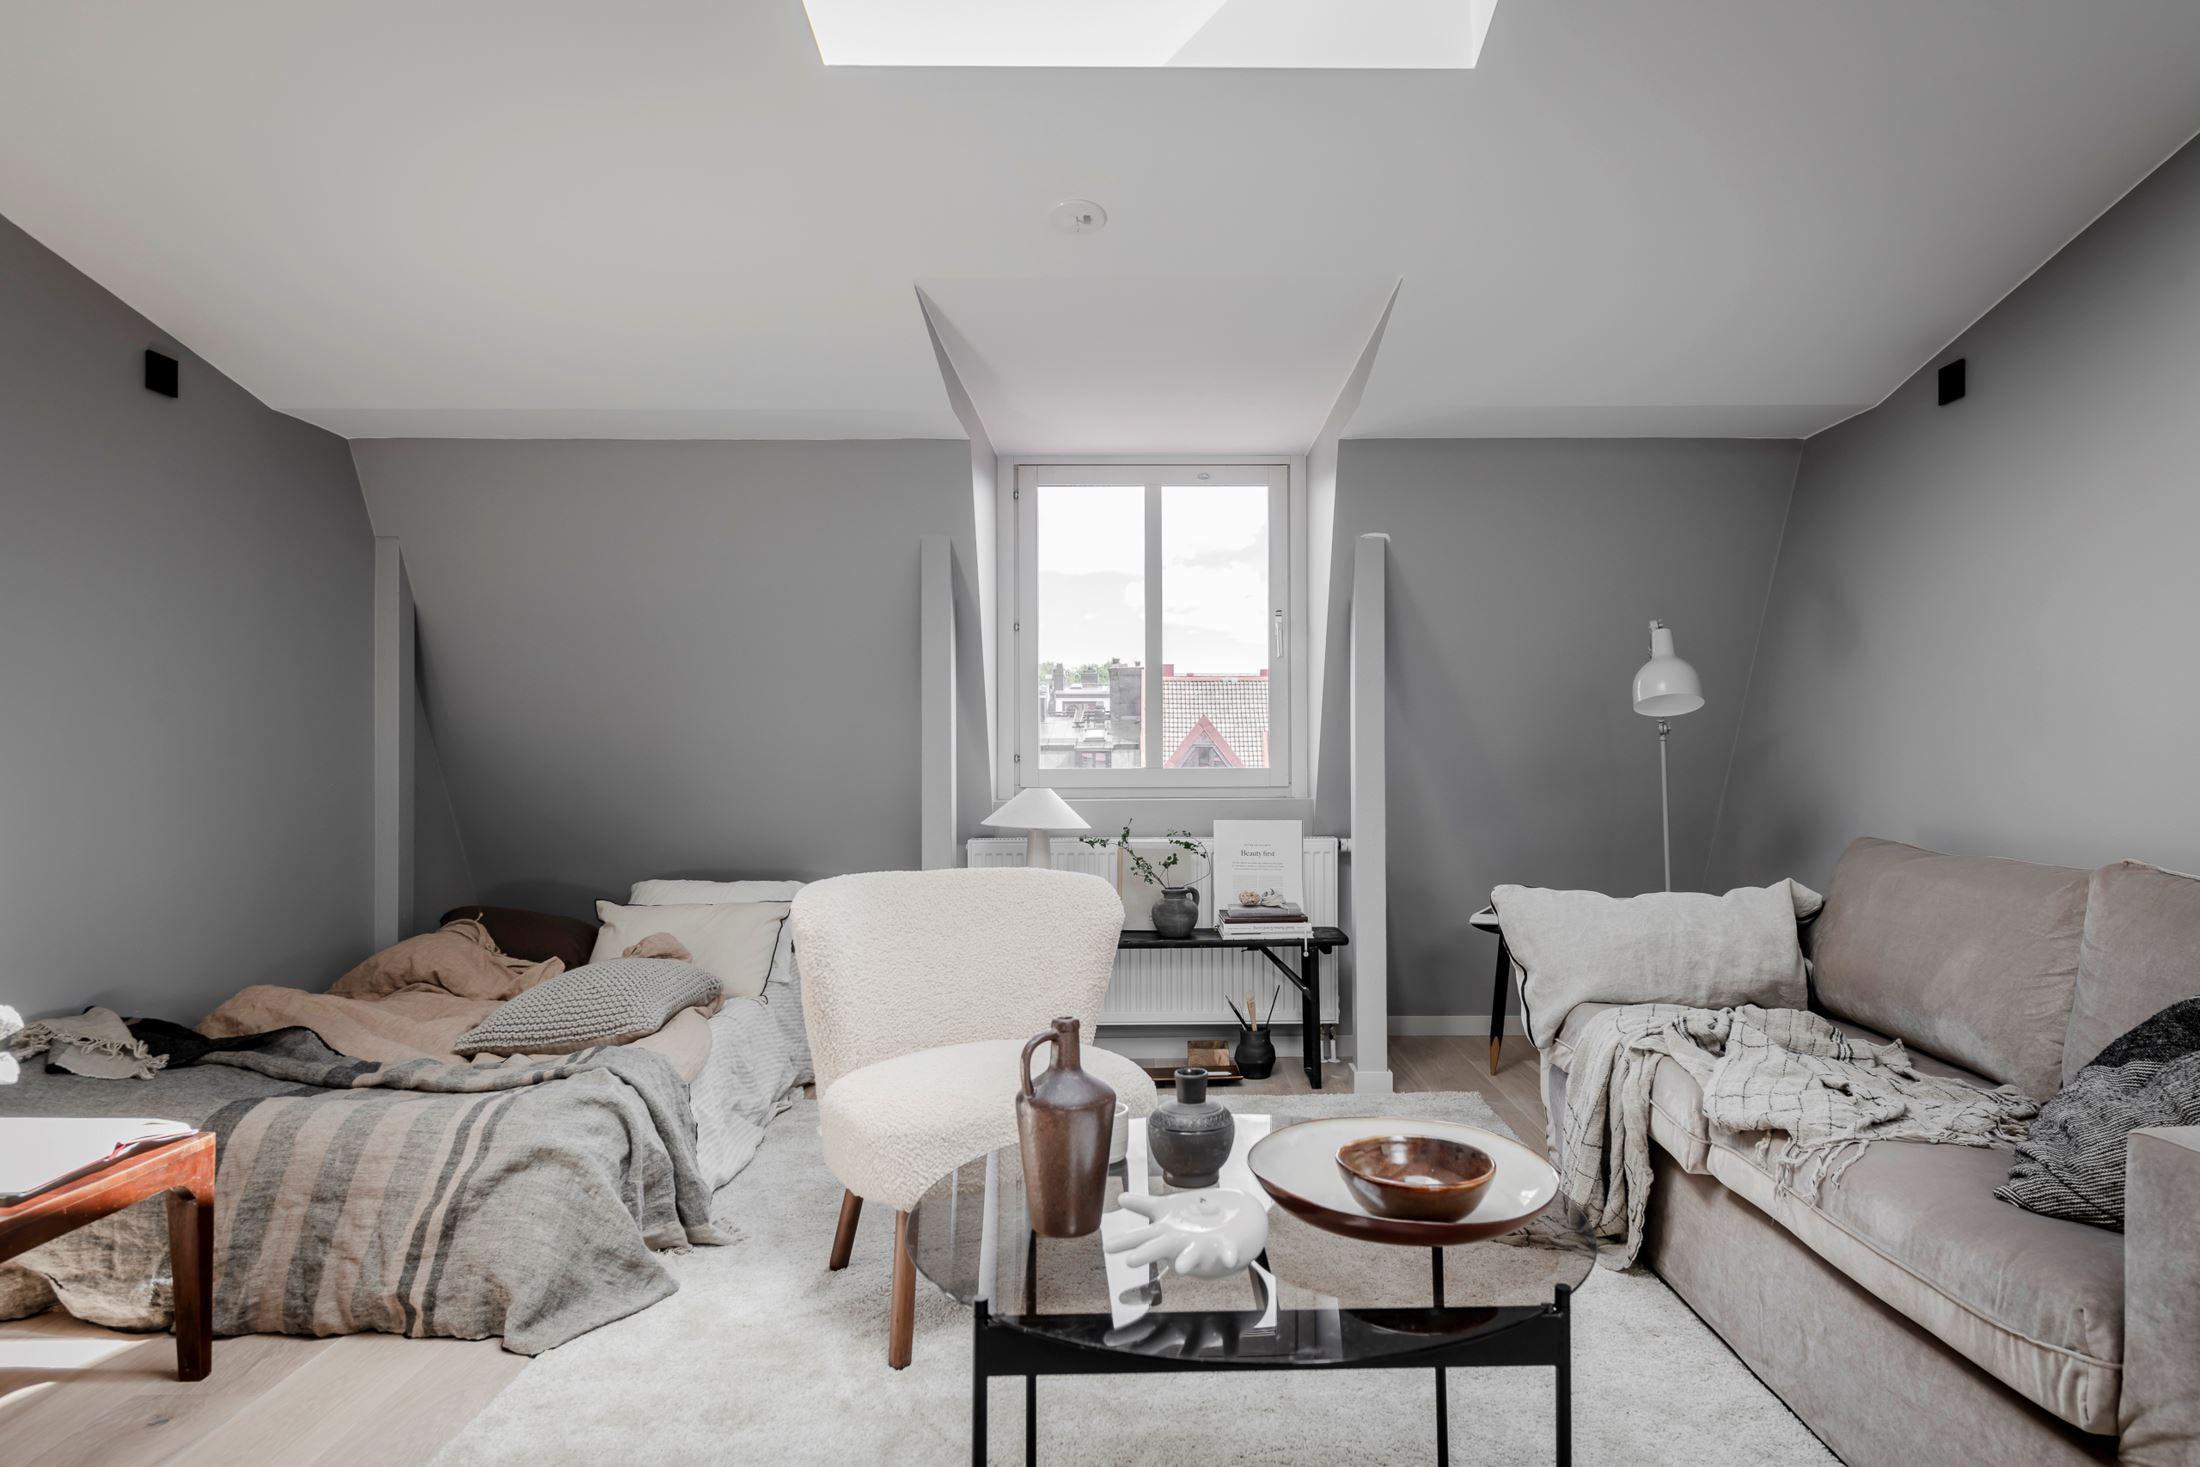 Plan deschis și decor nordic într o garsonieră la mansardă 35 m² 15